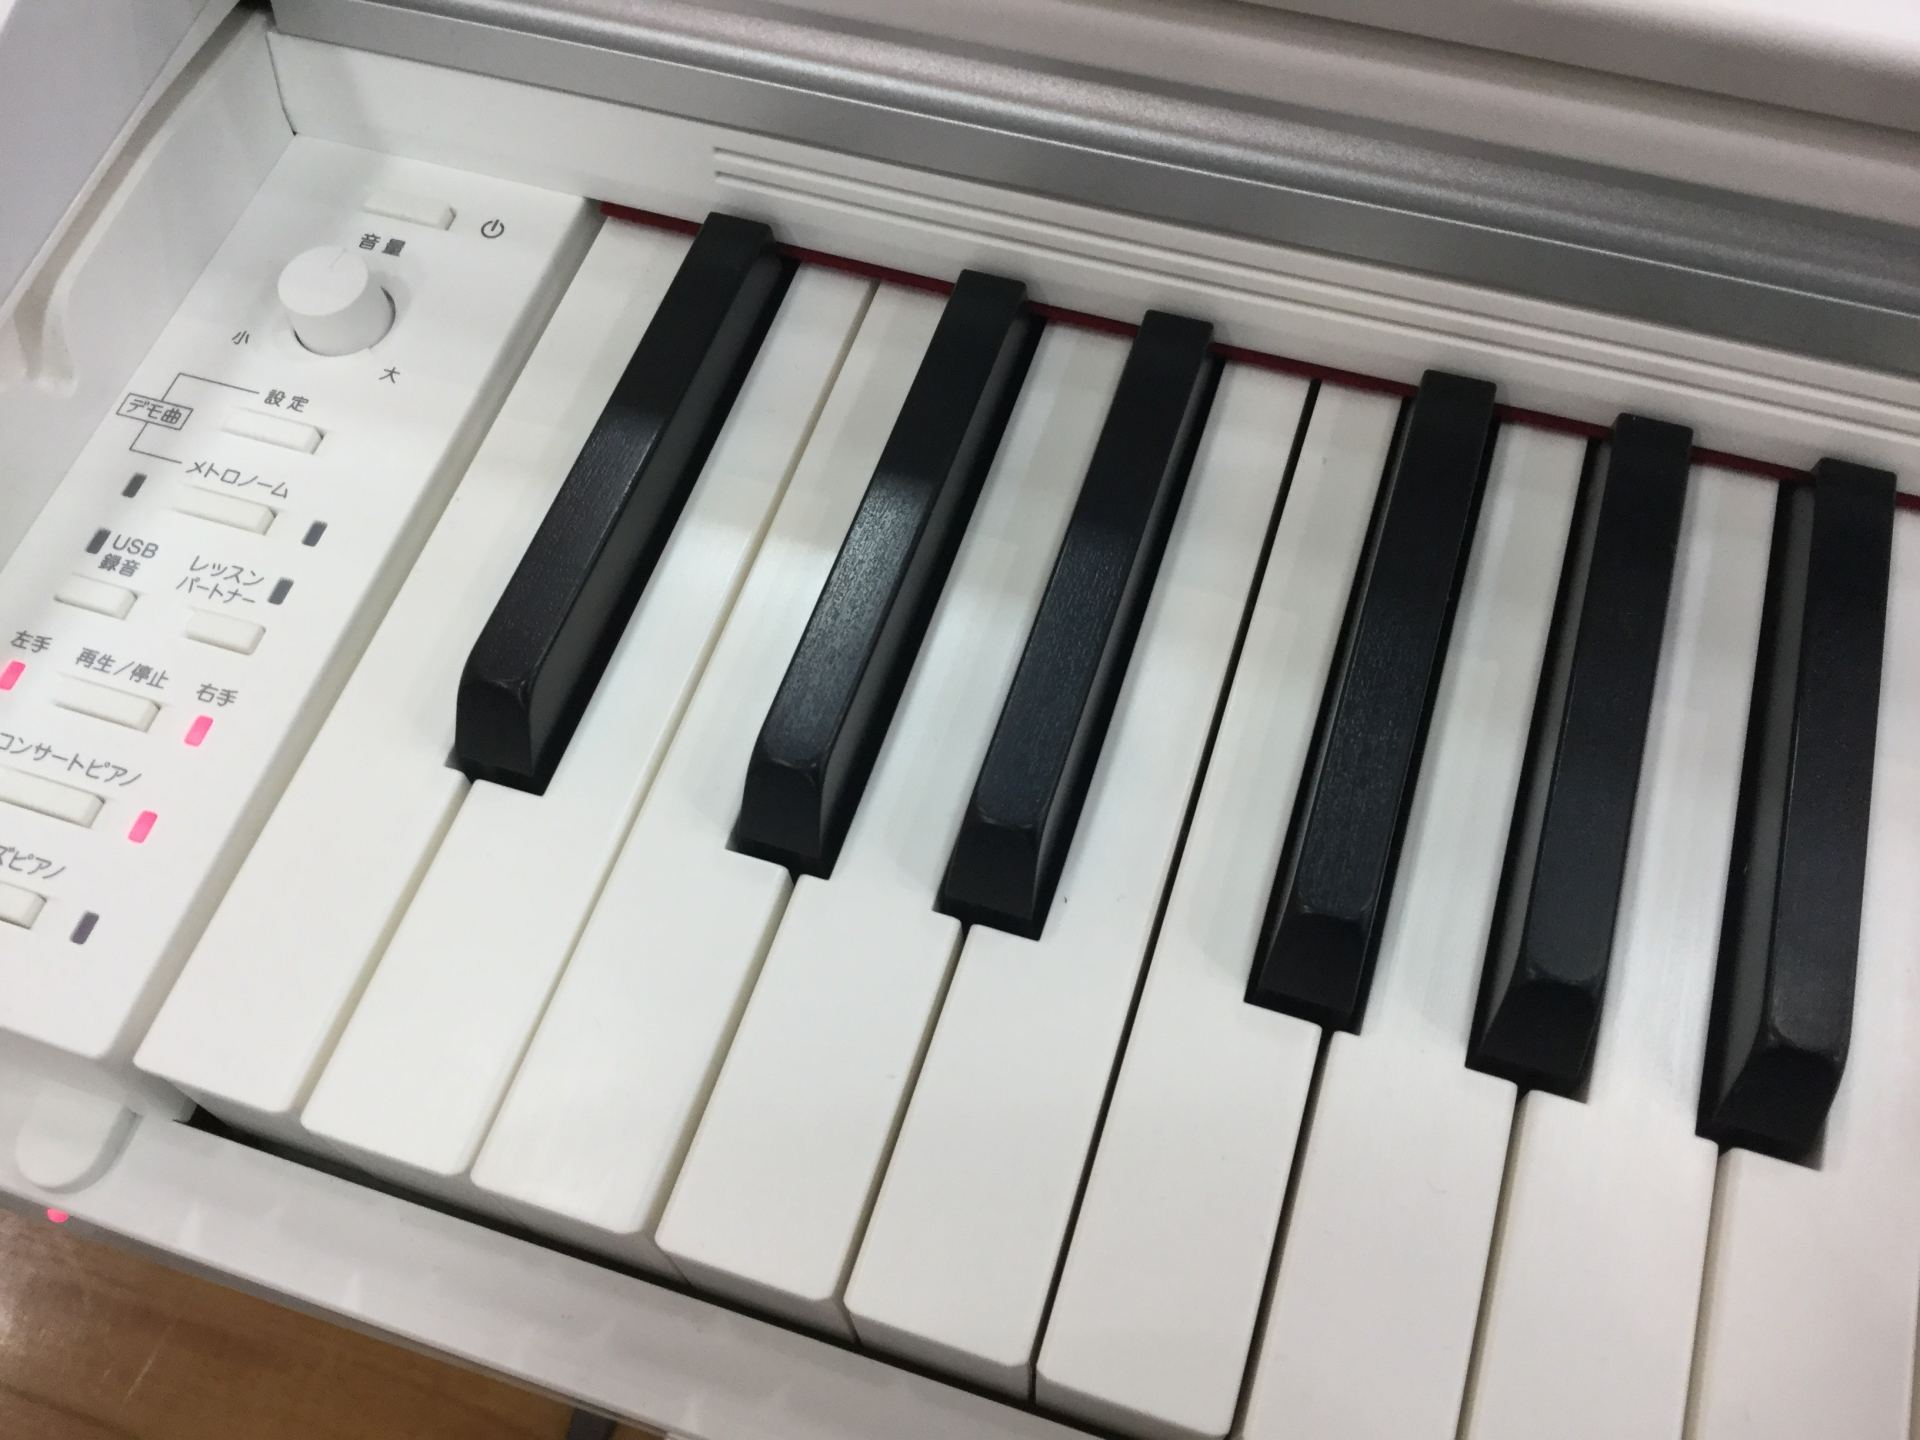 島村楽器 カシオ PX-2000GP 利府 多賀城 塩釜